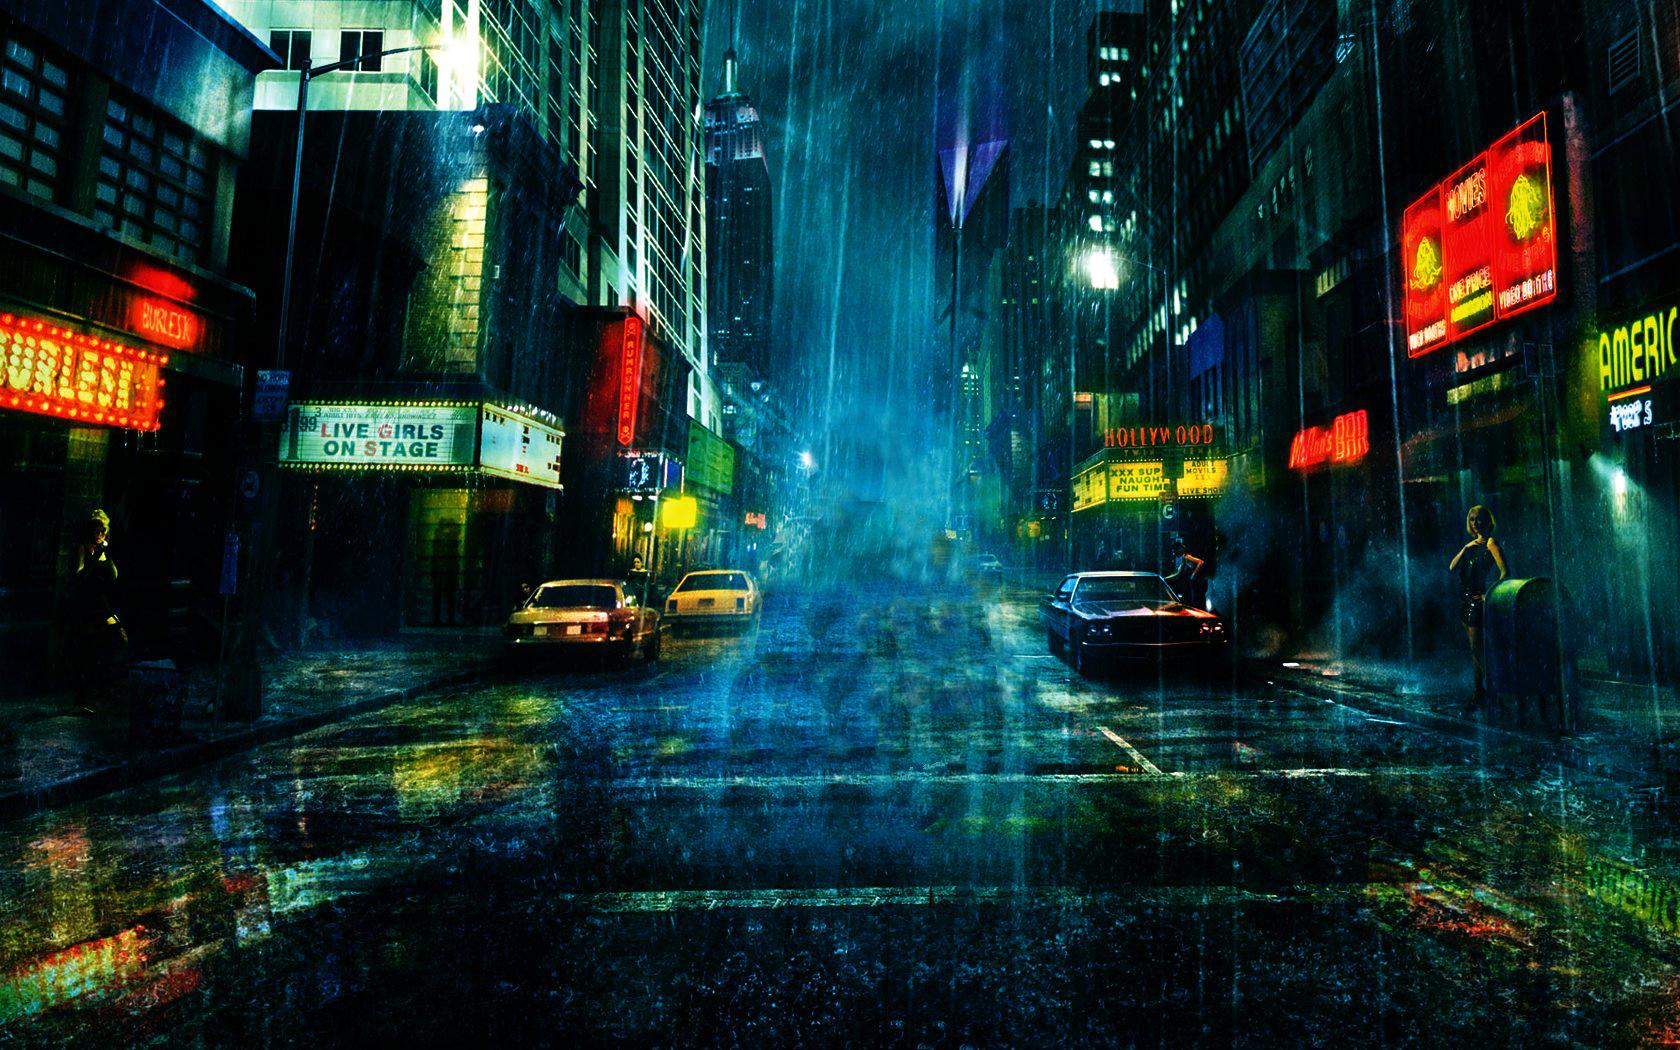 rain-city-wallpaper-for-iphone-For-Desktop-Wallpaper